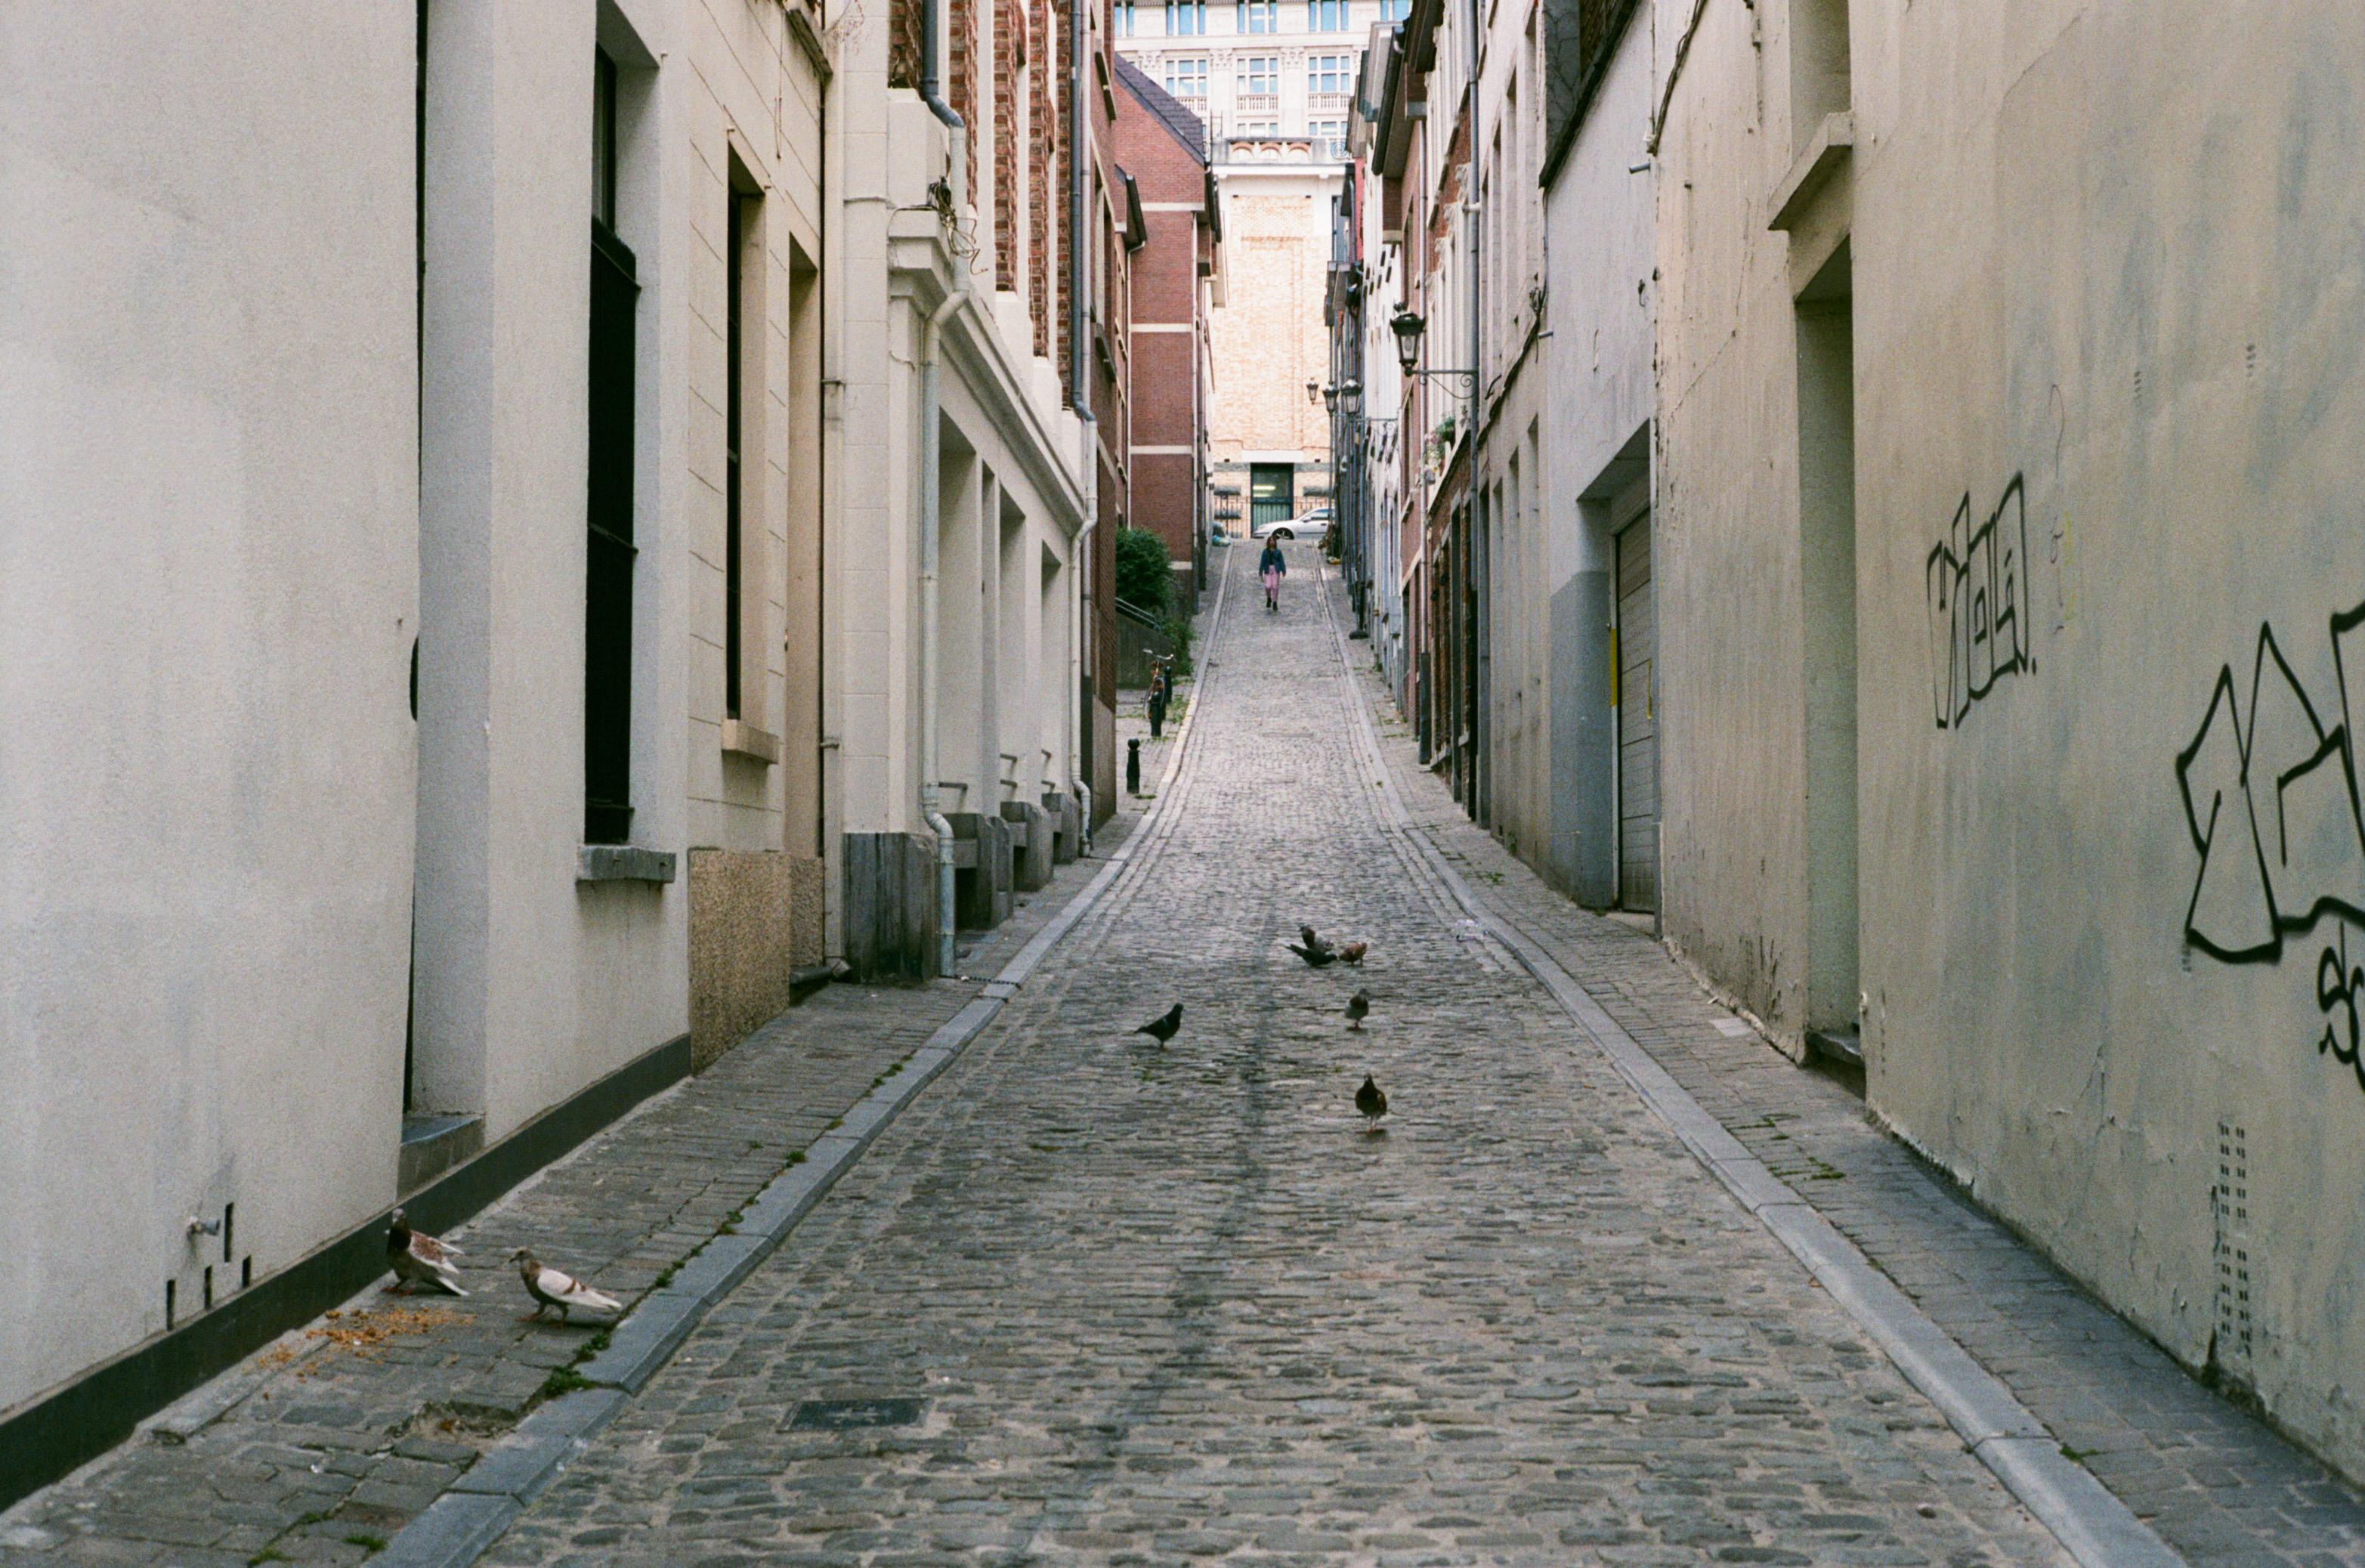 Birds struggle but adapt to a city life